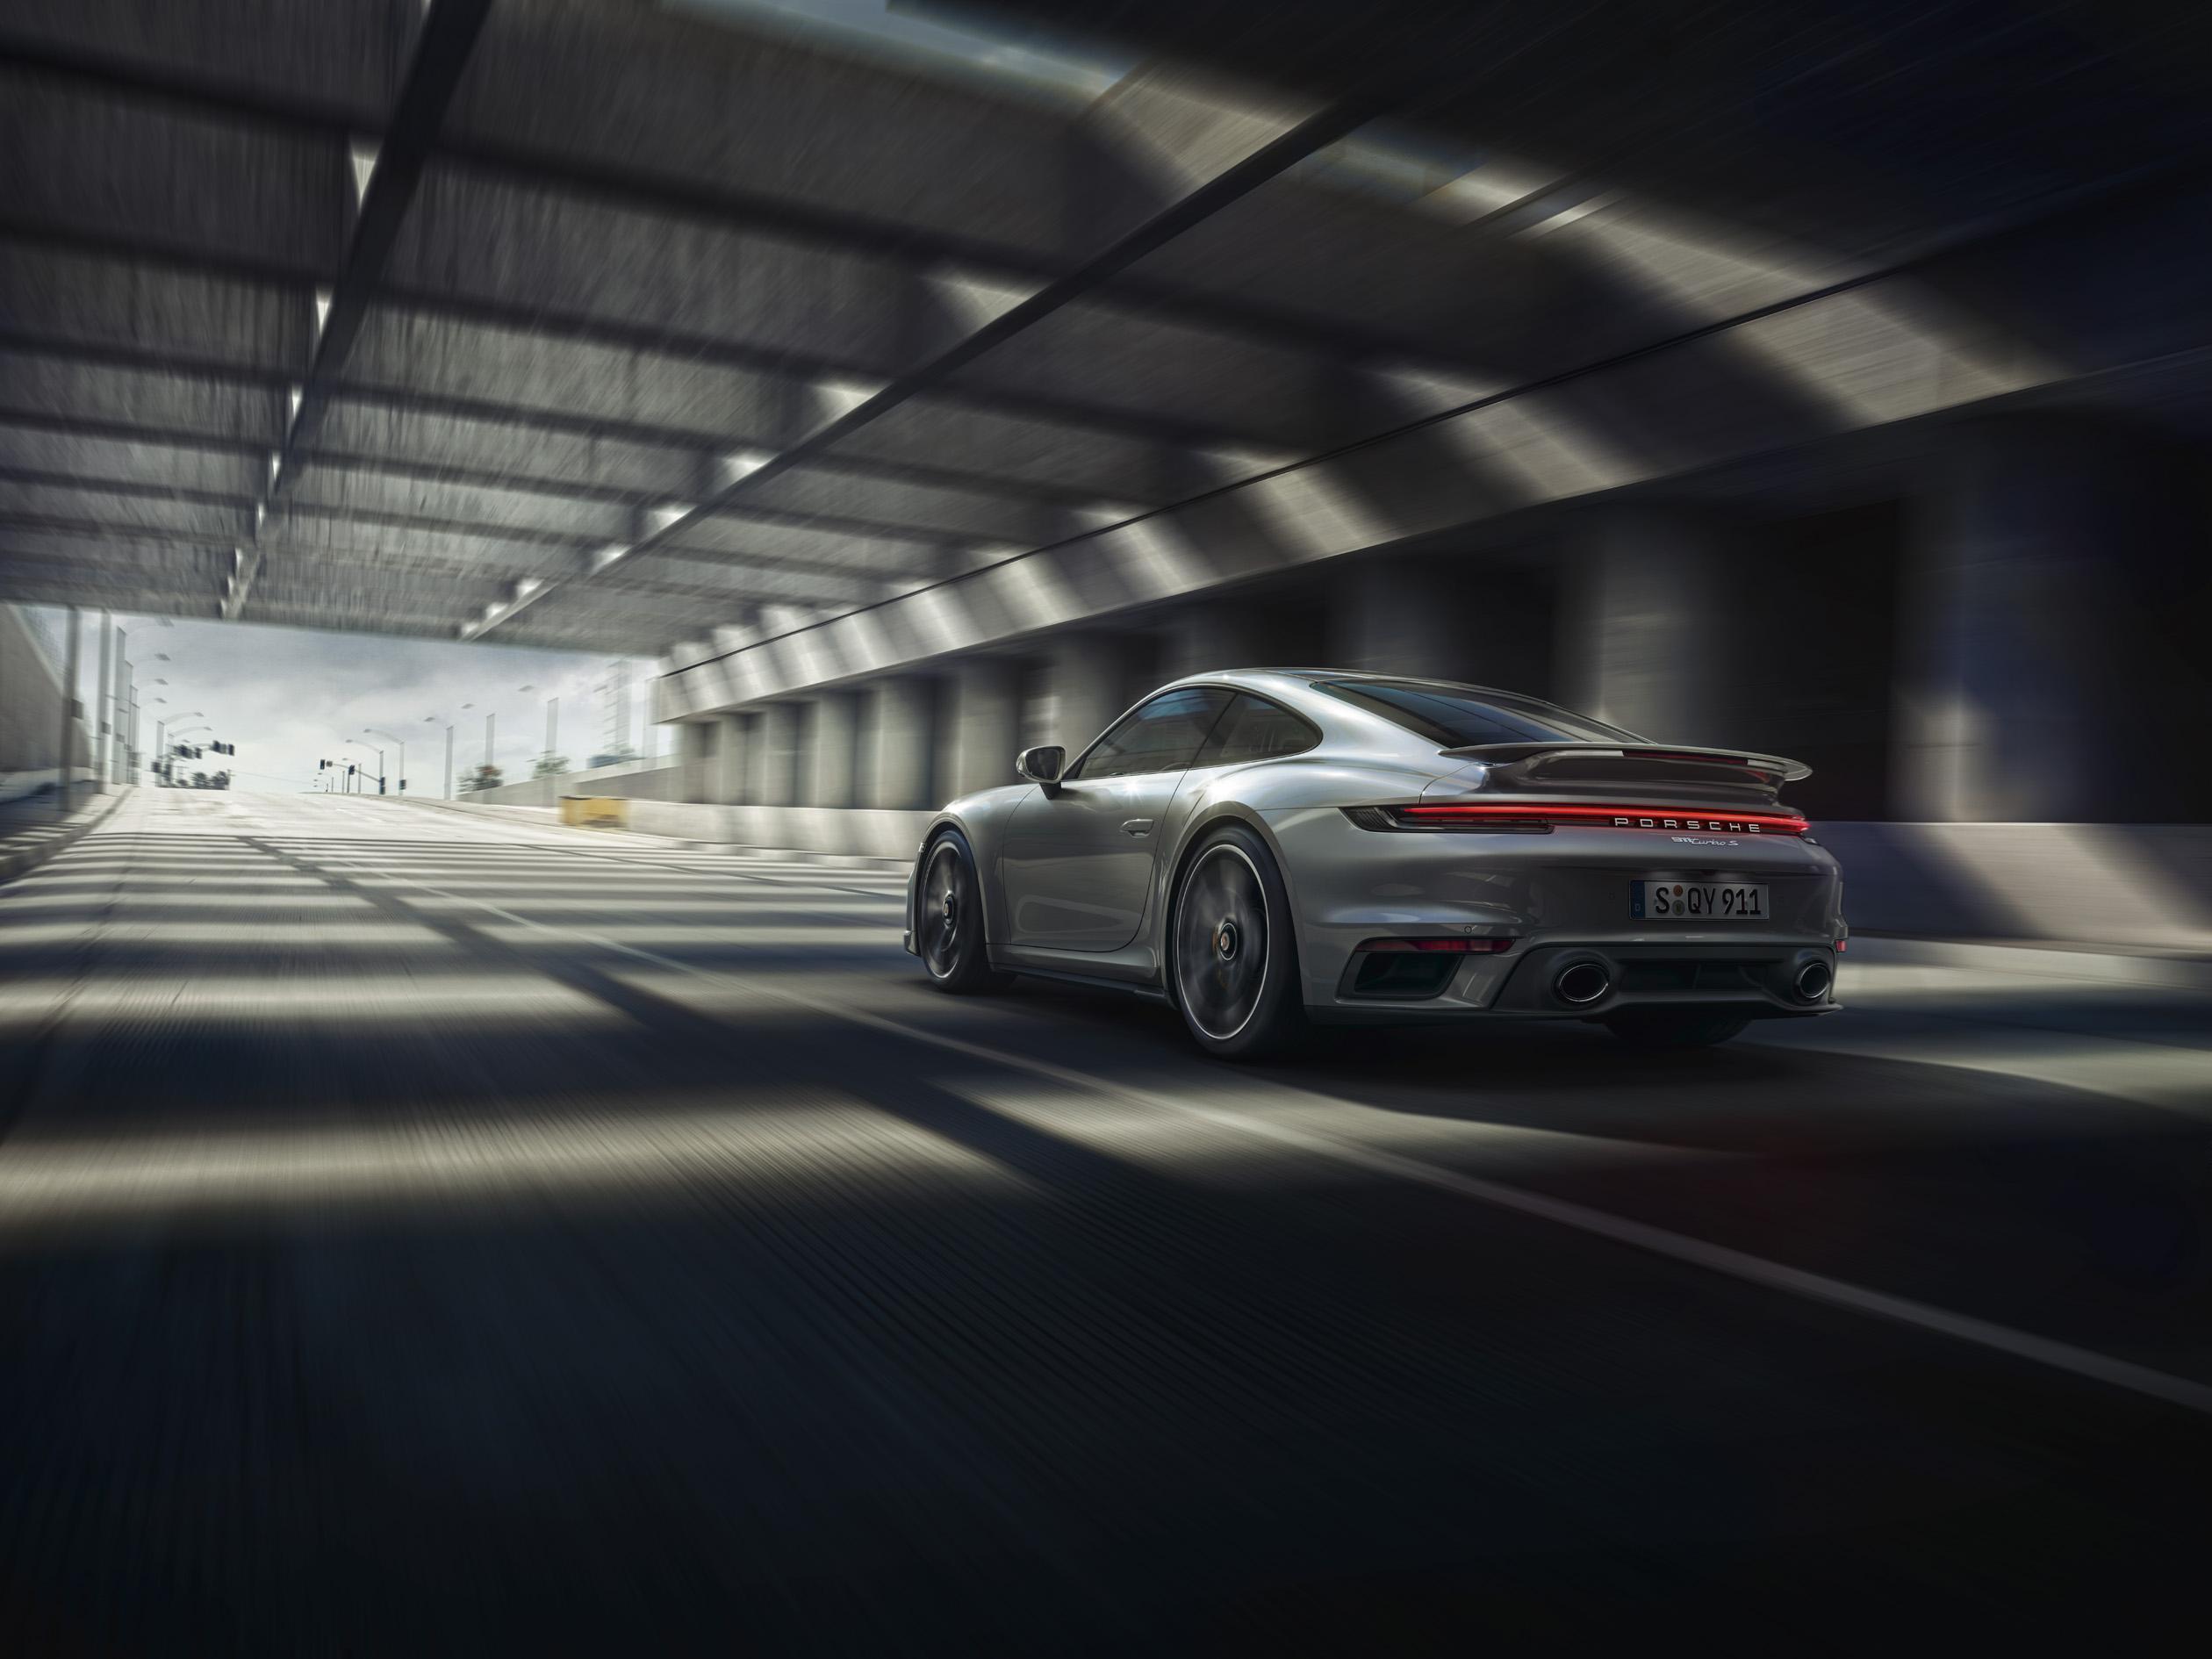 Porsche 911 Turbo S rear 3/4